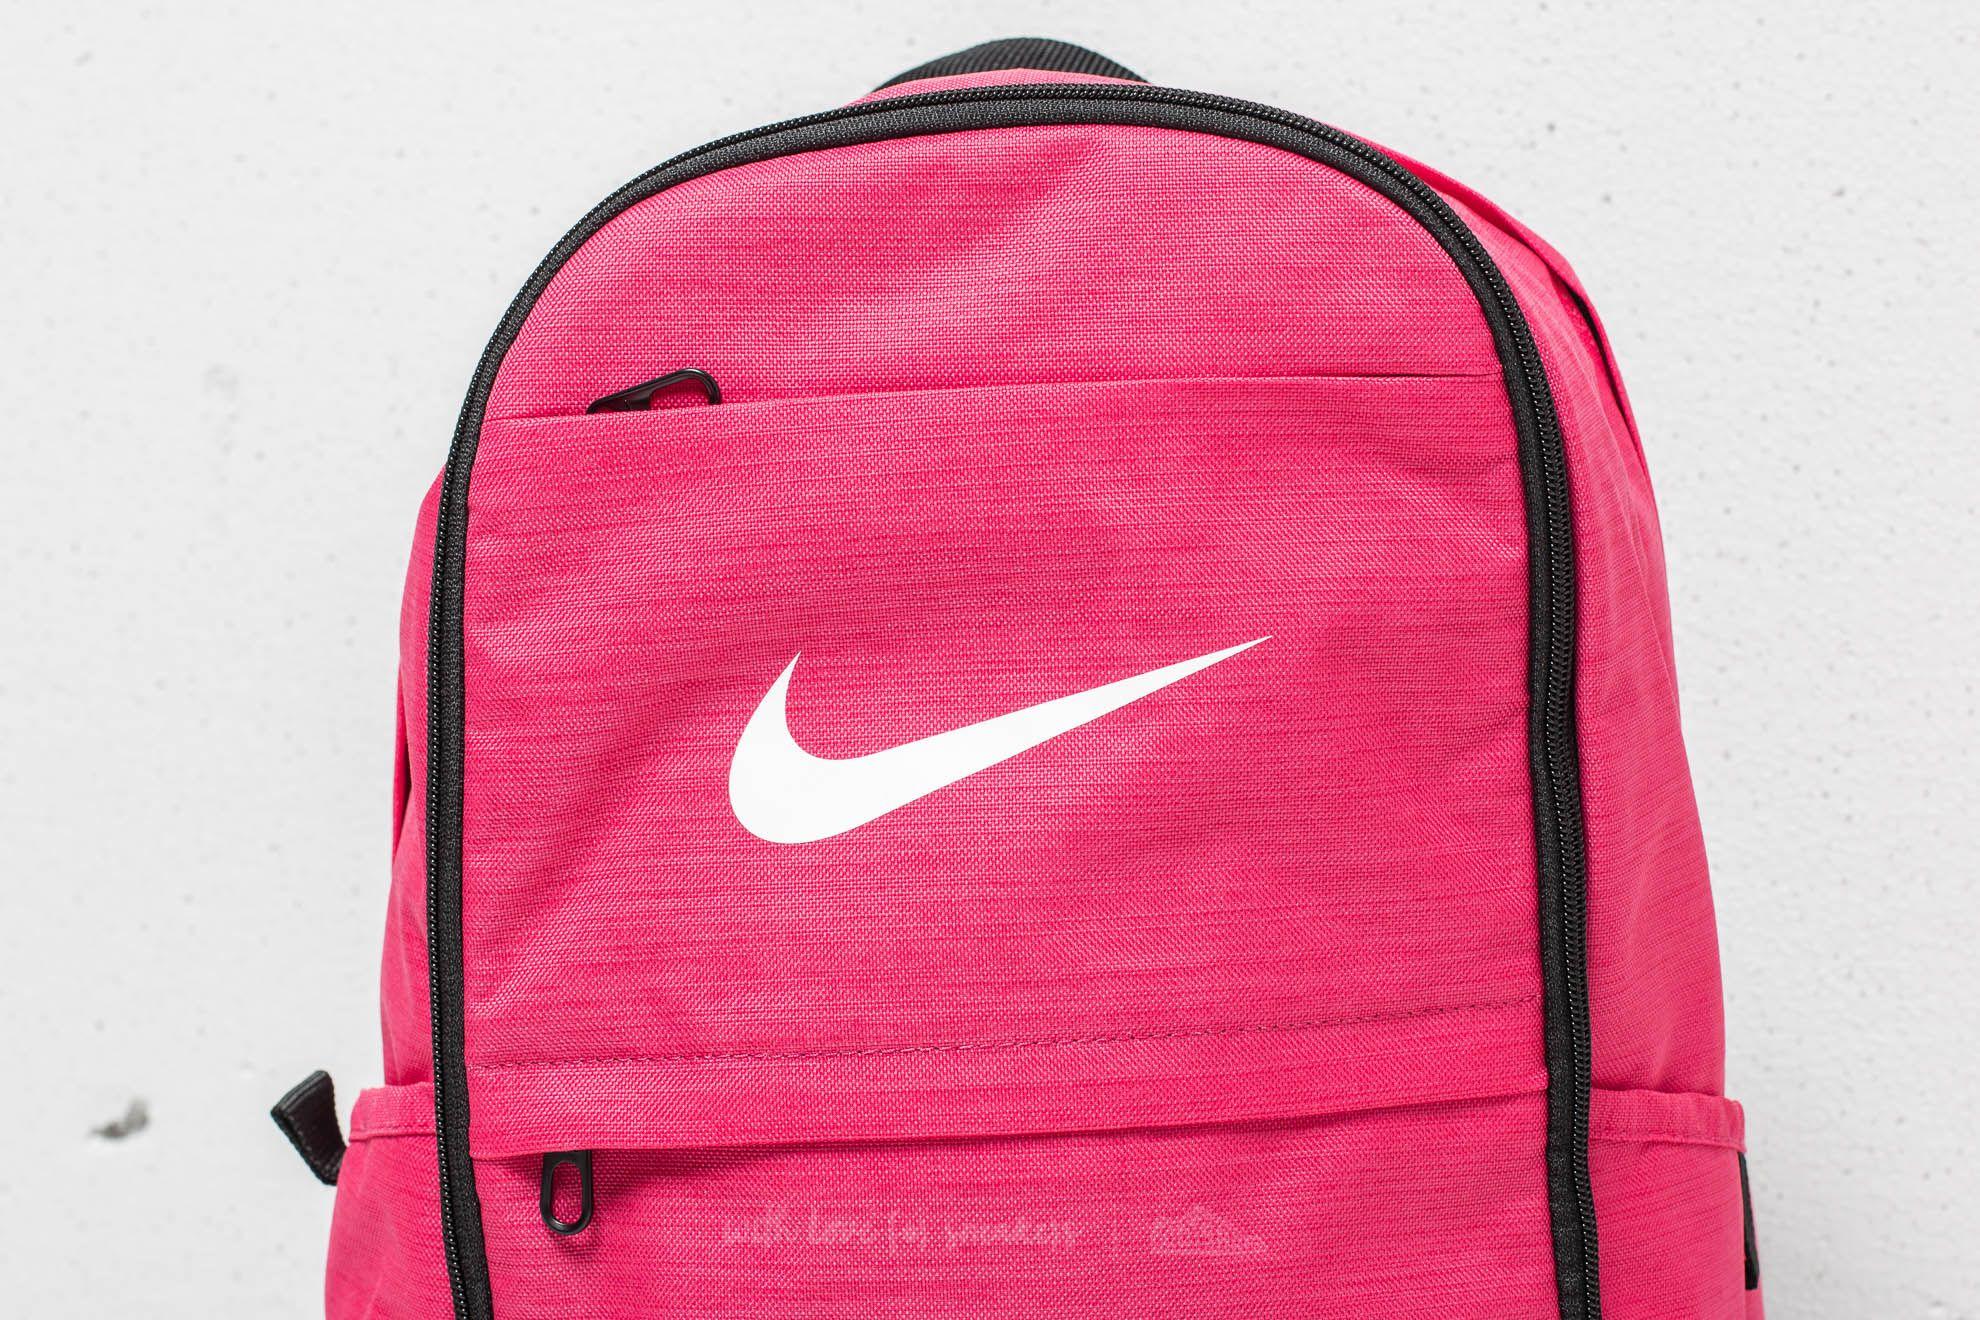 7b86d4ce76d Nike brasilia backpack pink black white footshop jpg 1980x1320 Pink nike  backpack